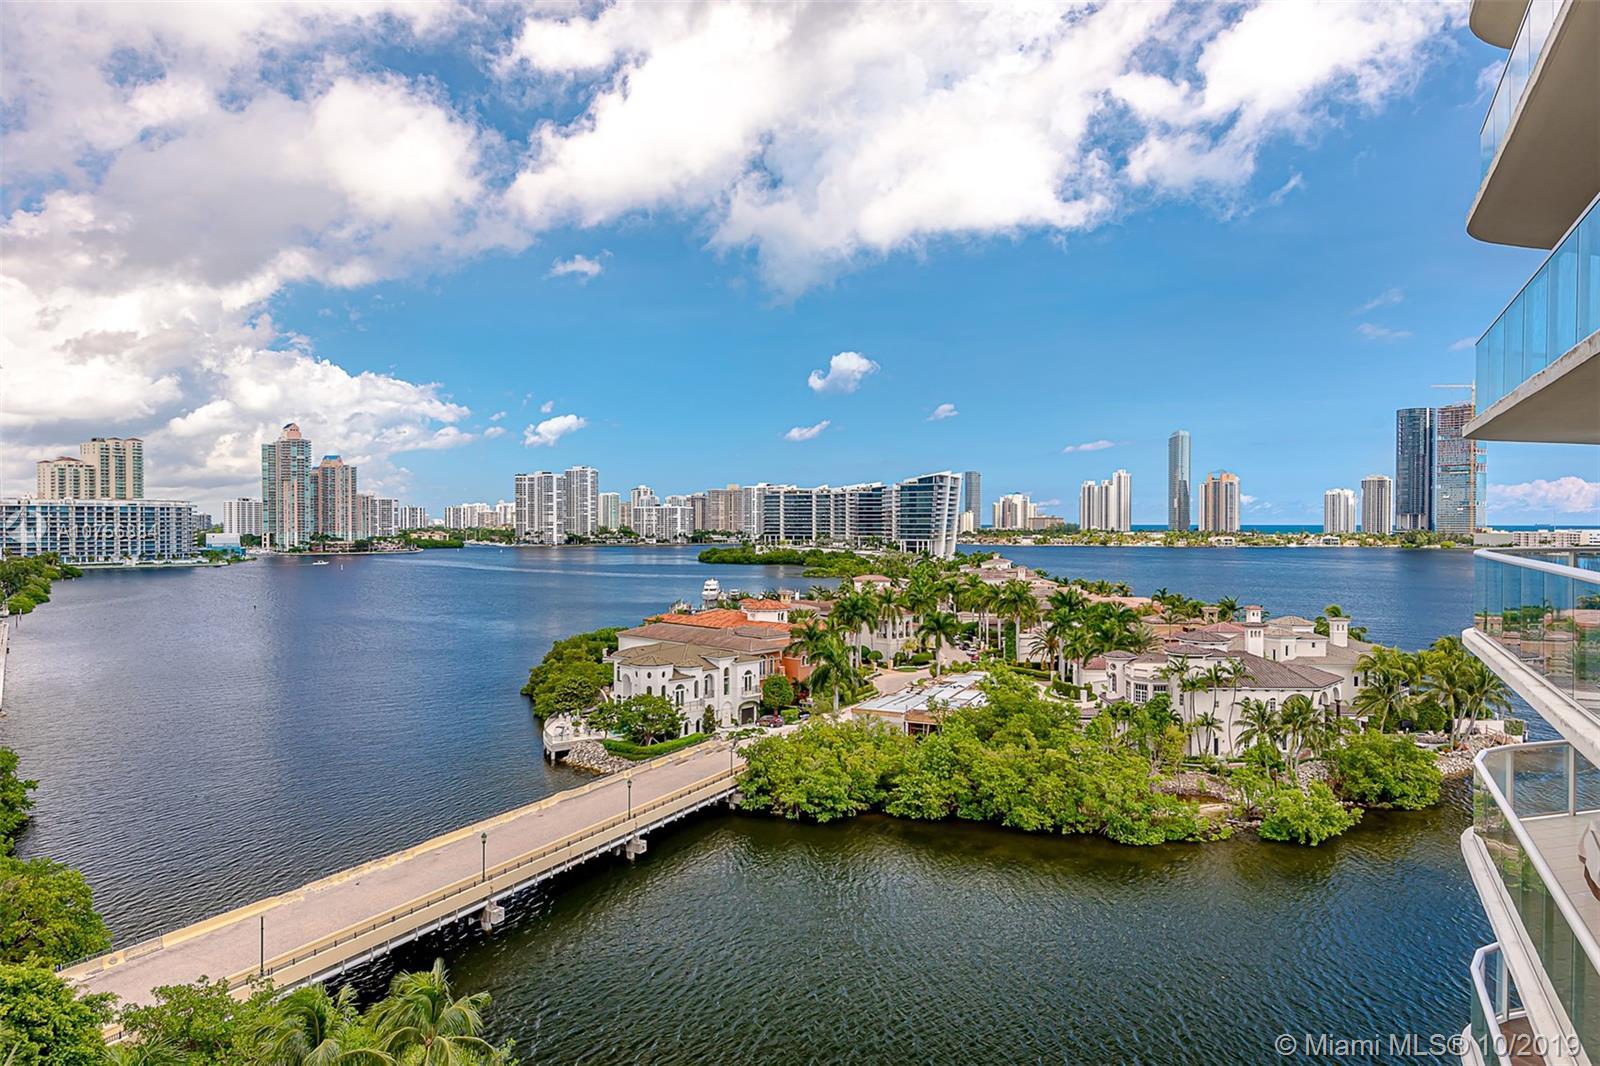 4000 Island Blvd 1005, Aventura, FL 33160